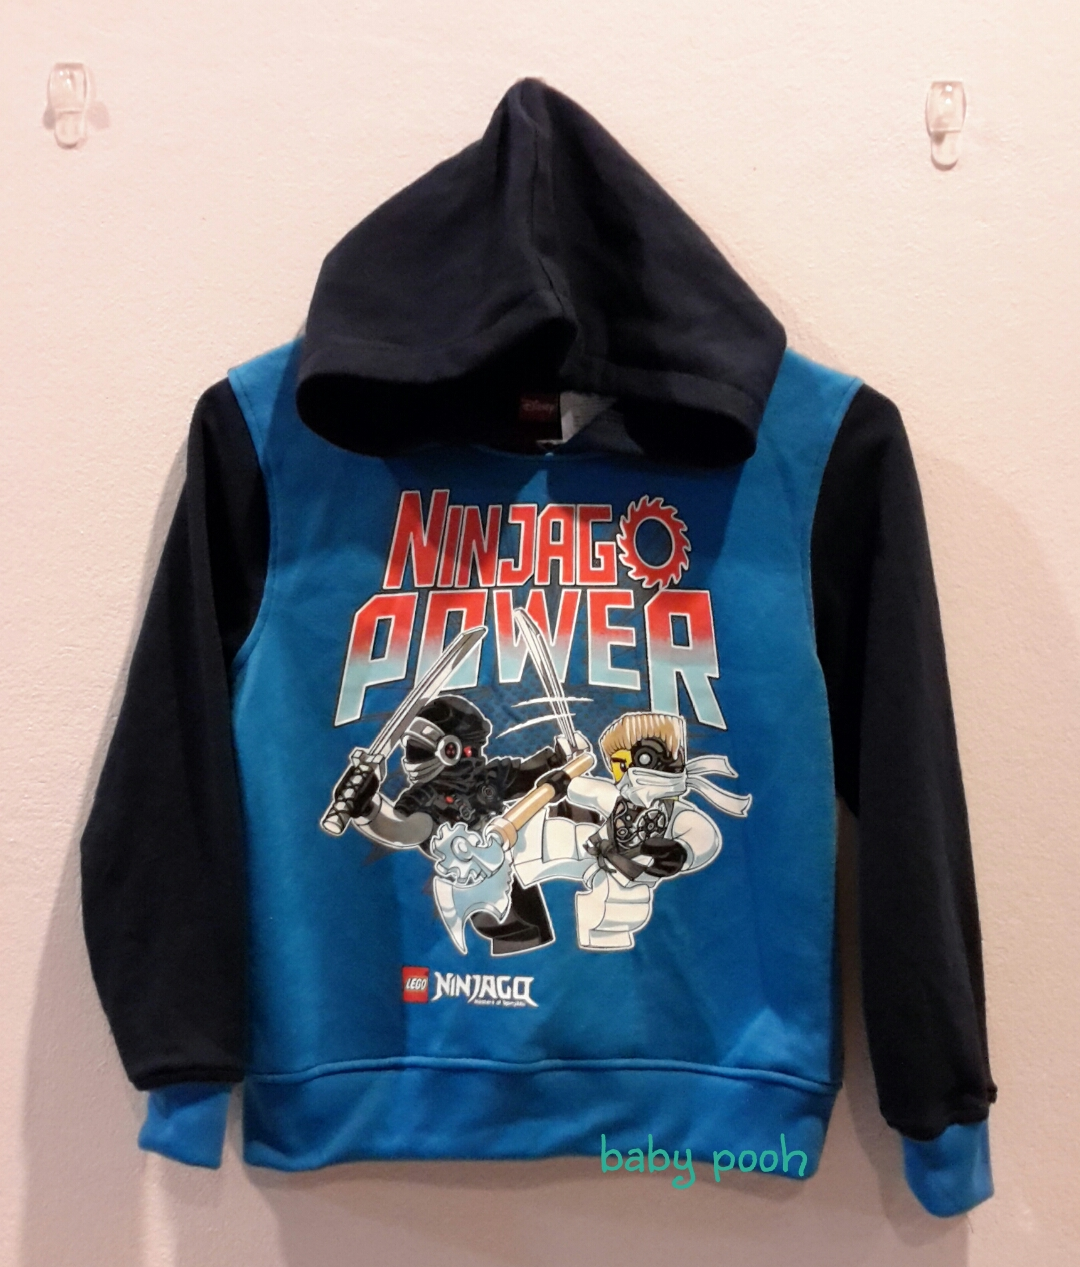 LEGO : เสื้อกันหนาวมีฮูด ลาย Ninja size 6y